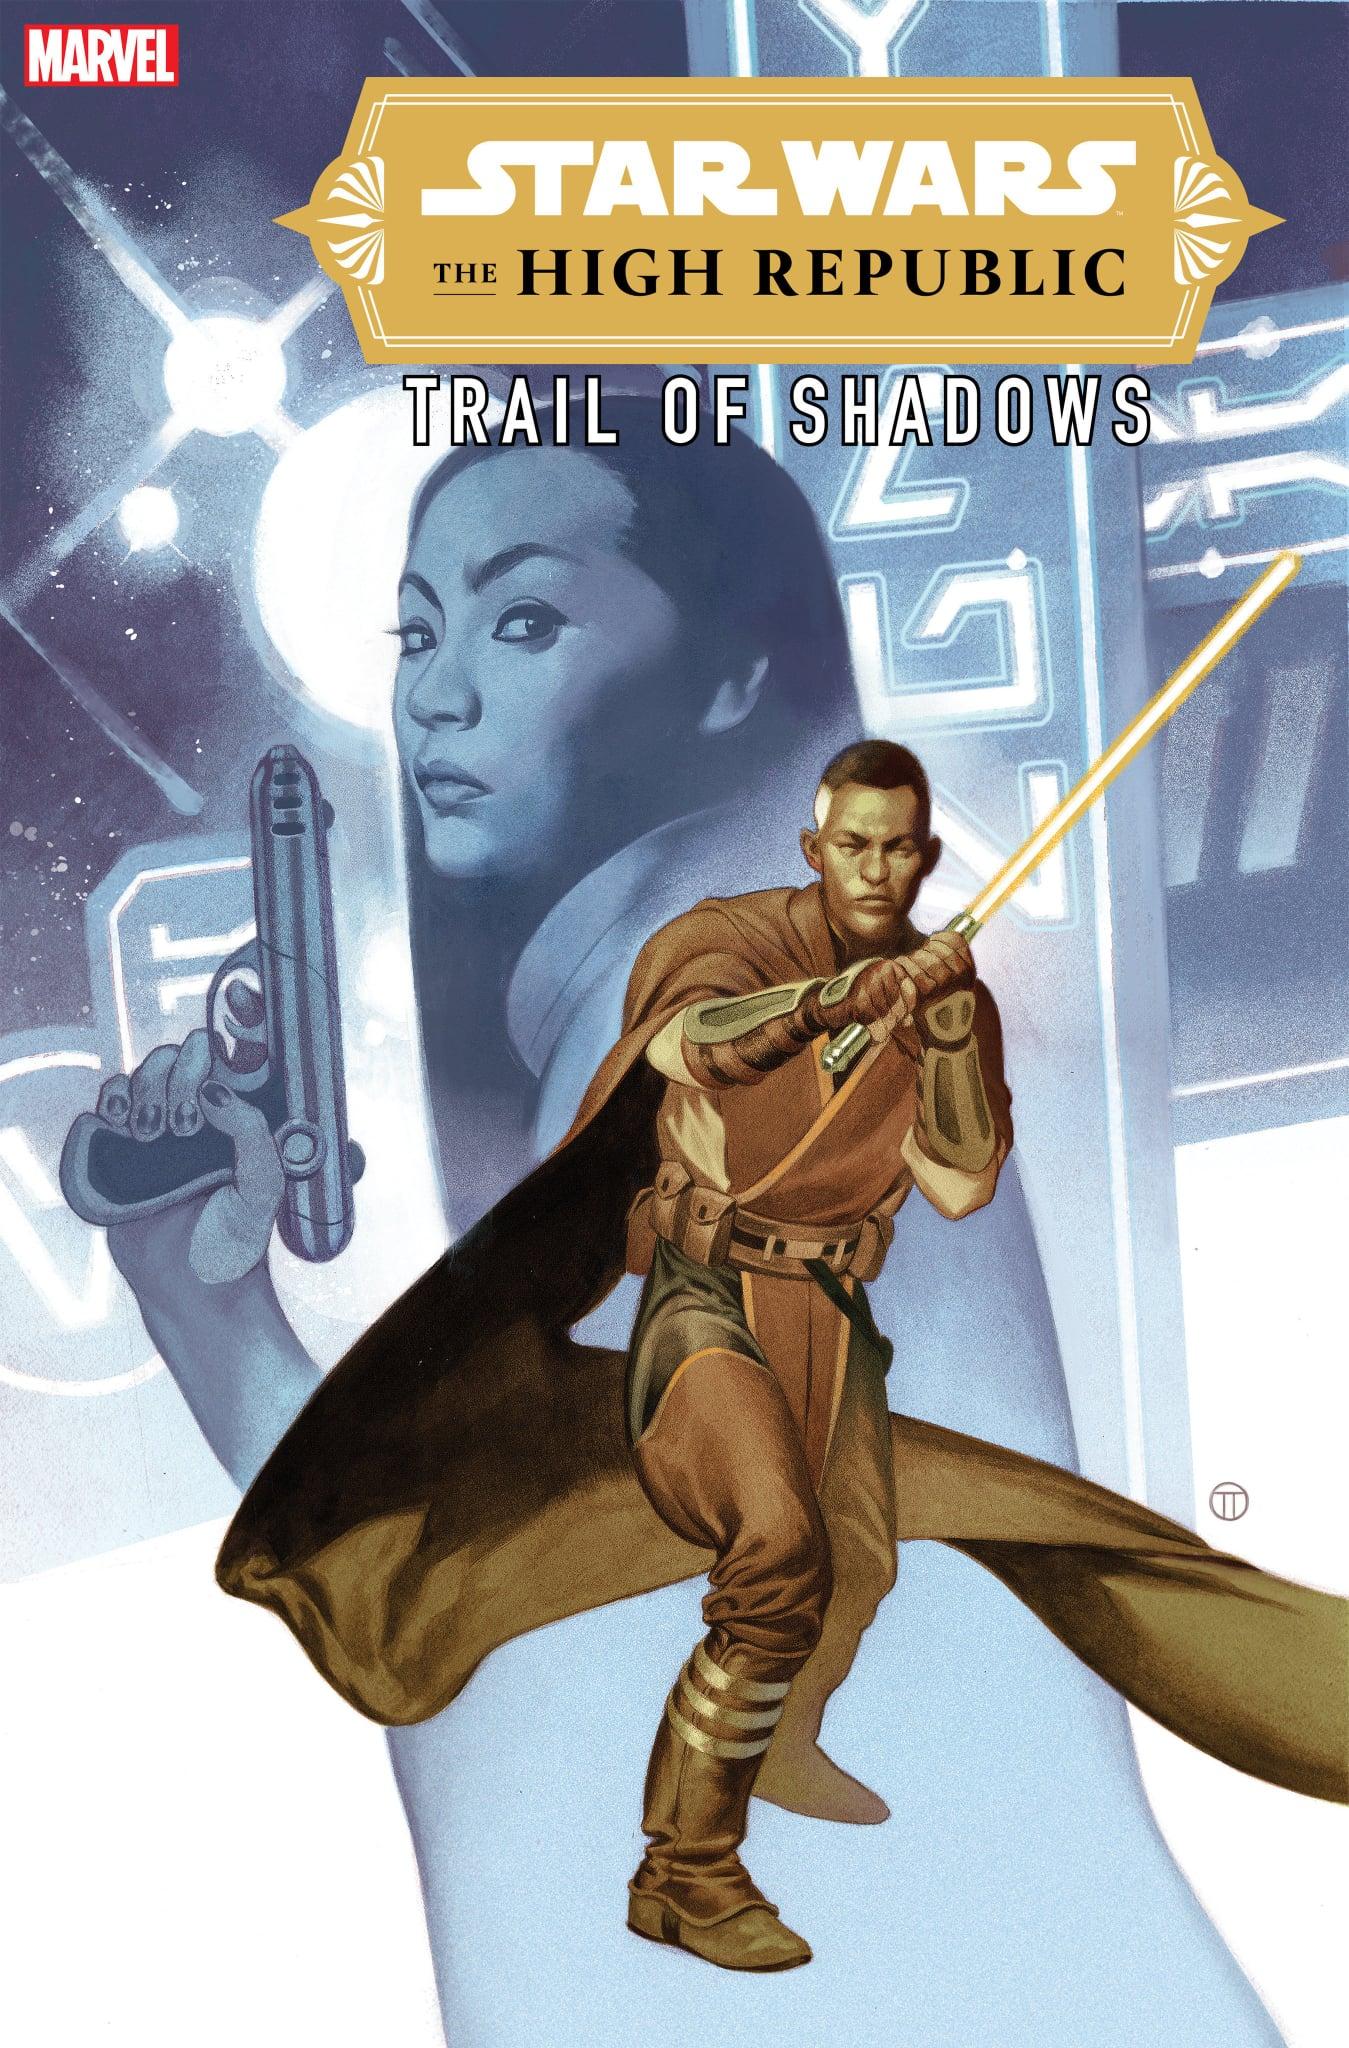 Star Wars The High Republic: Trail of Shadows 1 - Tedesco Variant